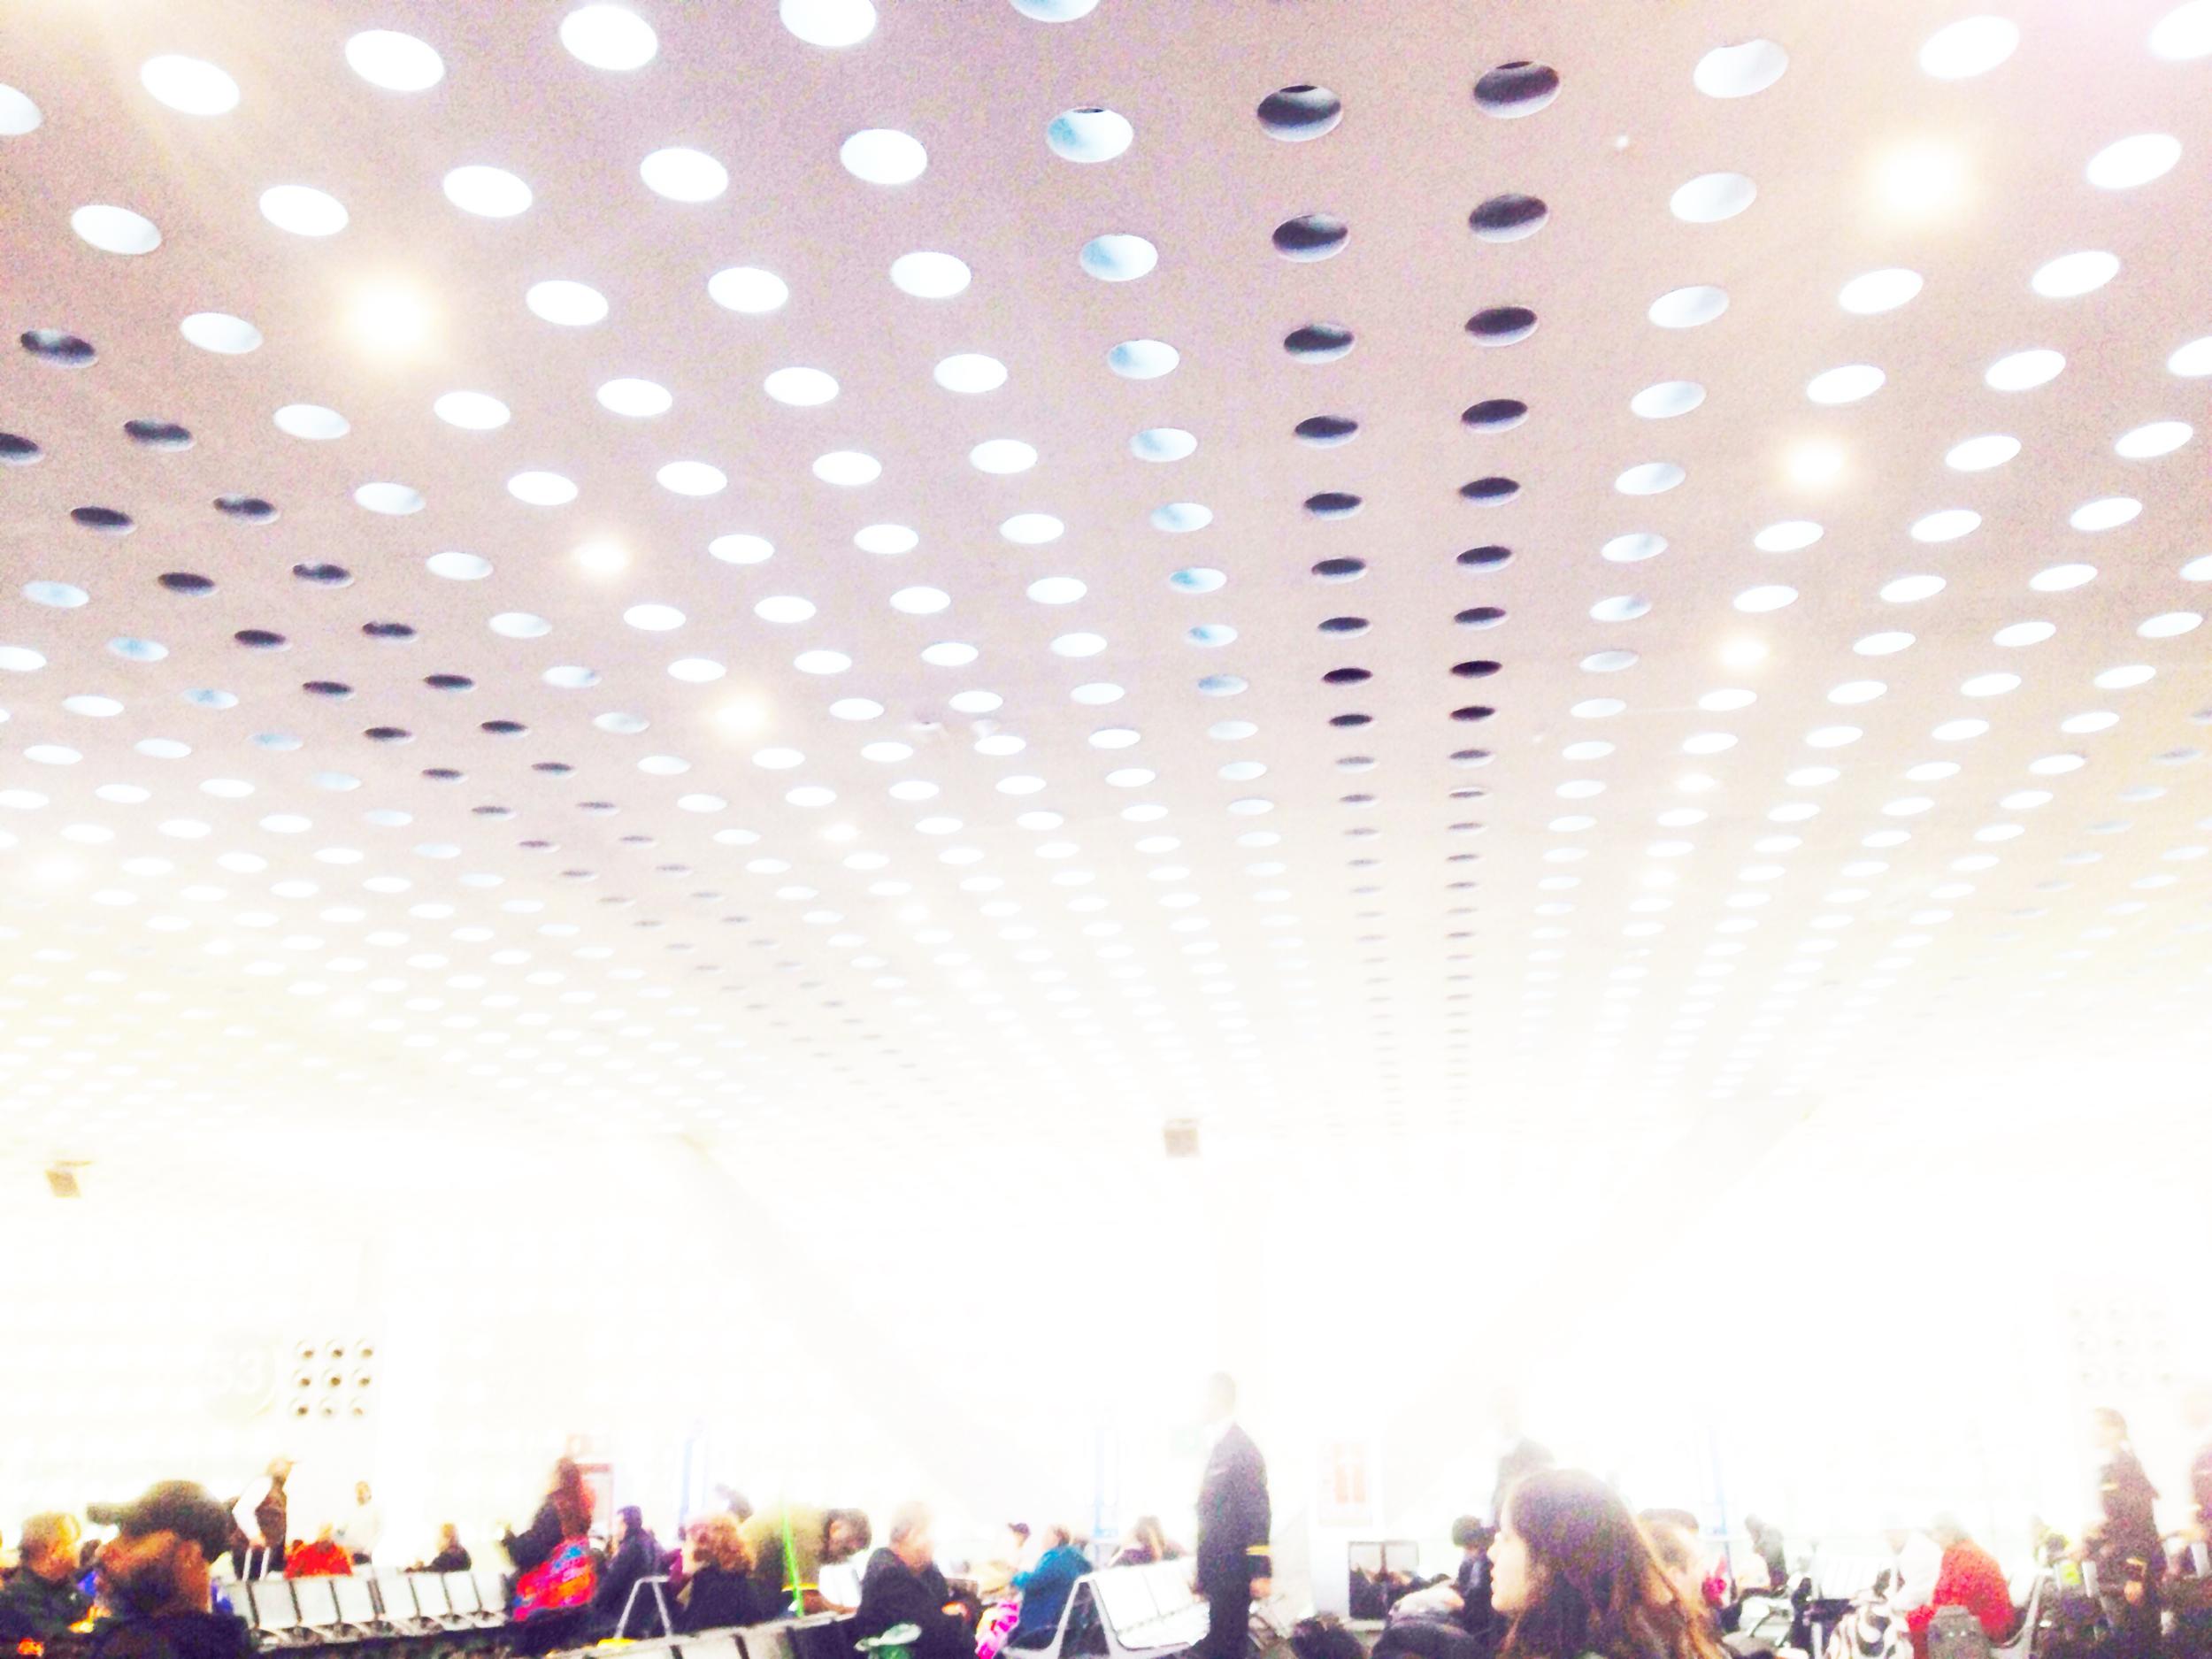 Them: Los Cabos International Airport, 2014-15